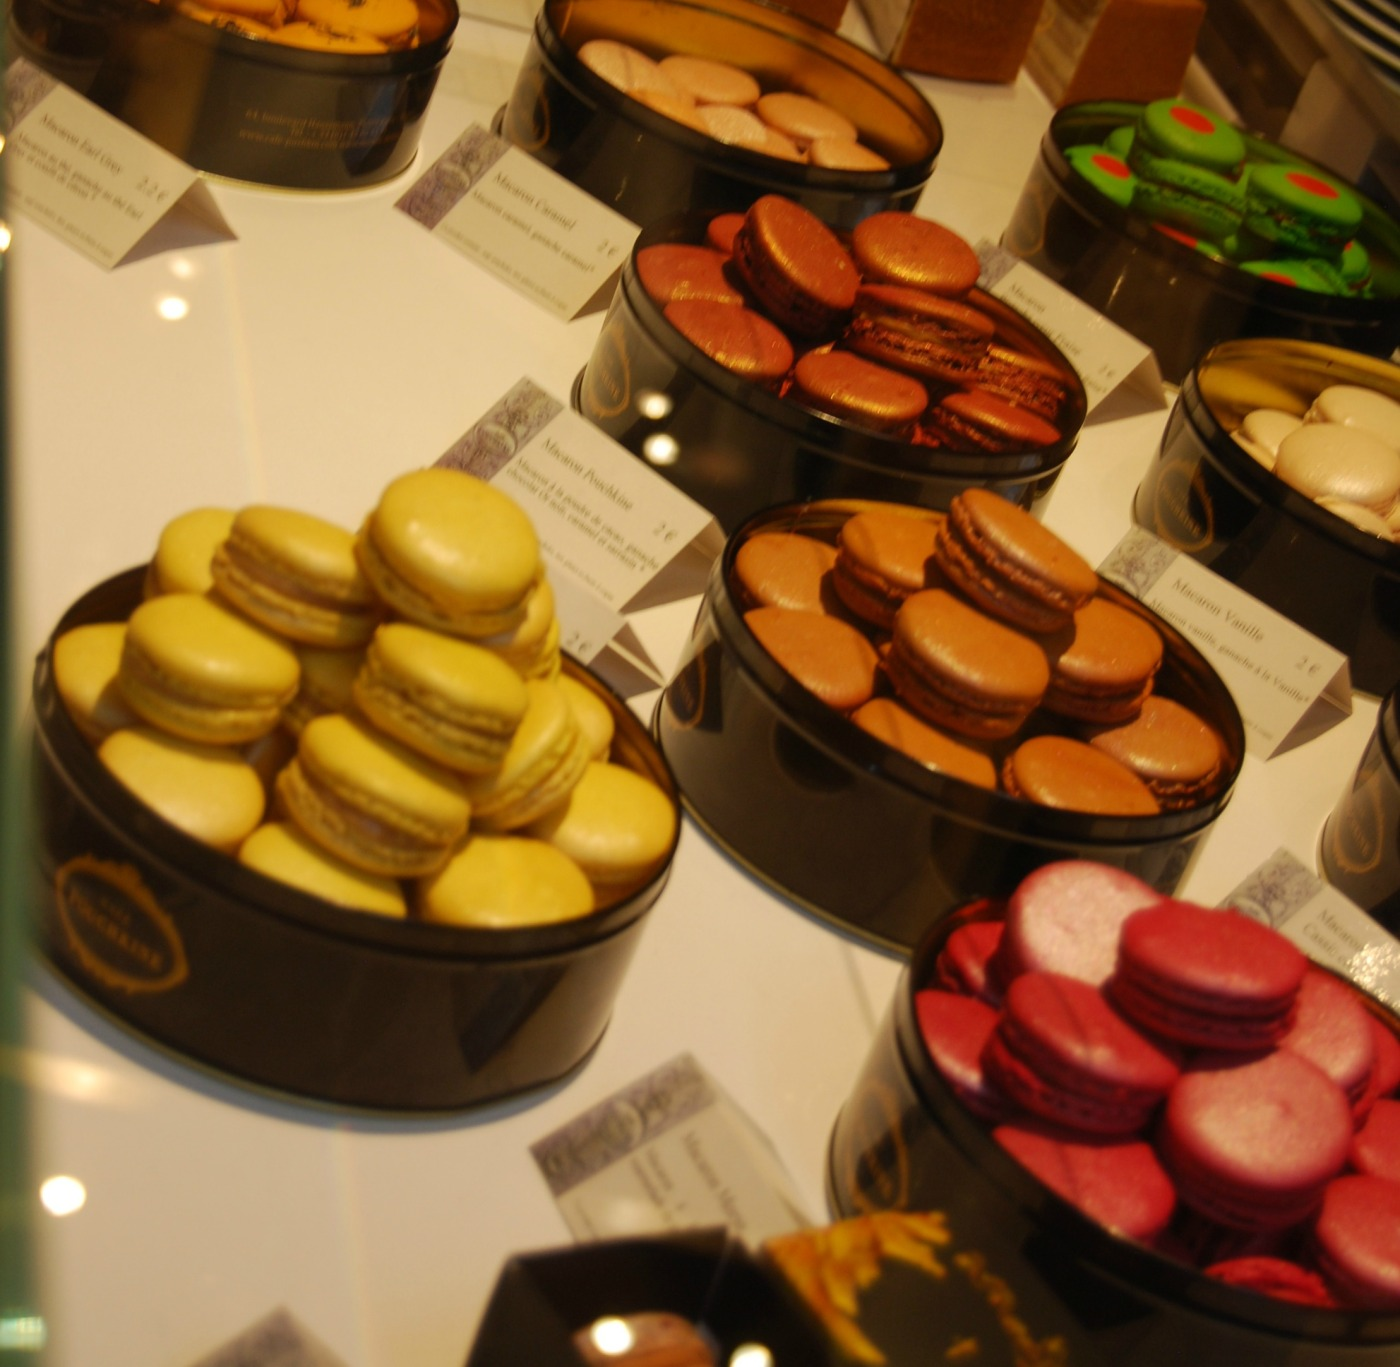 Café Pouchkine--Macarons